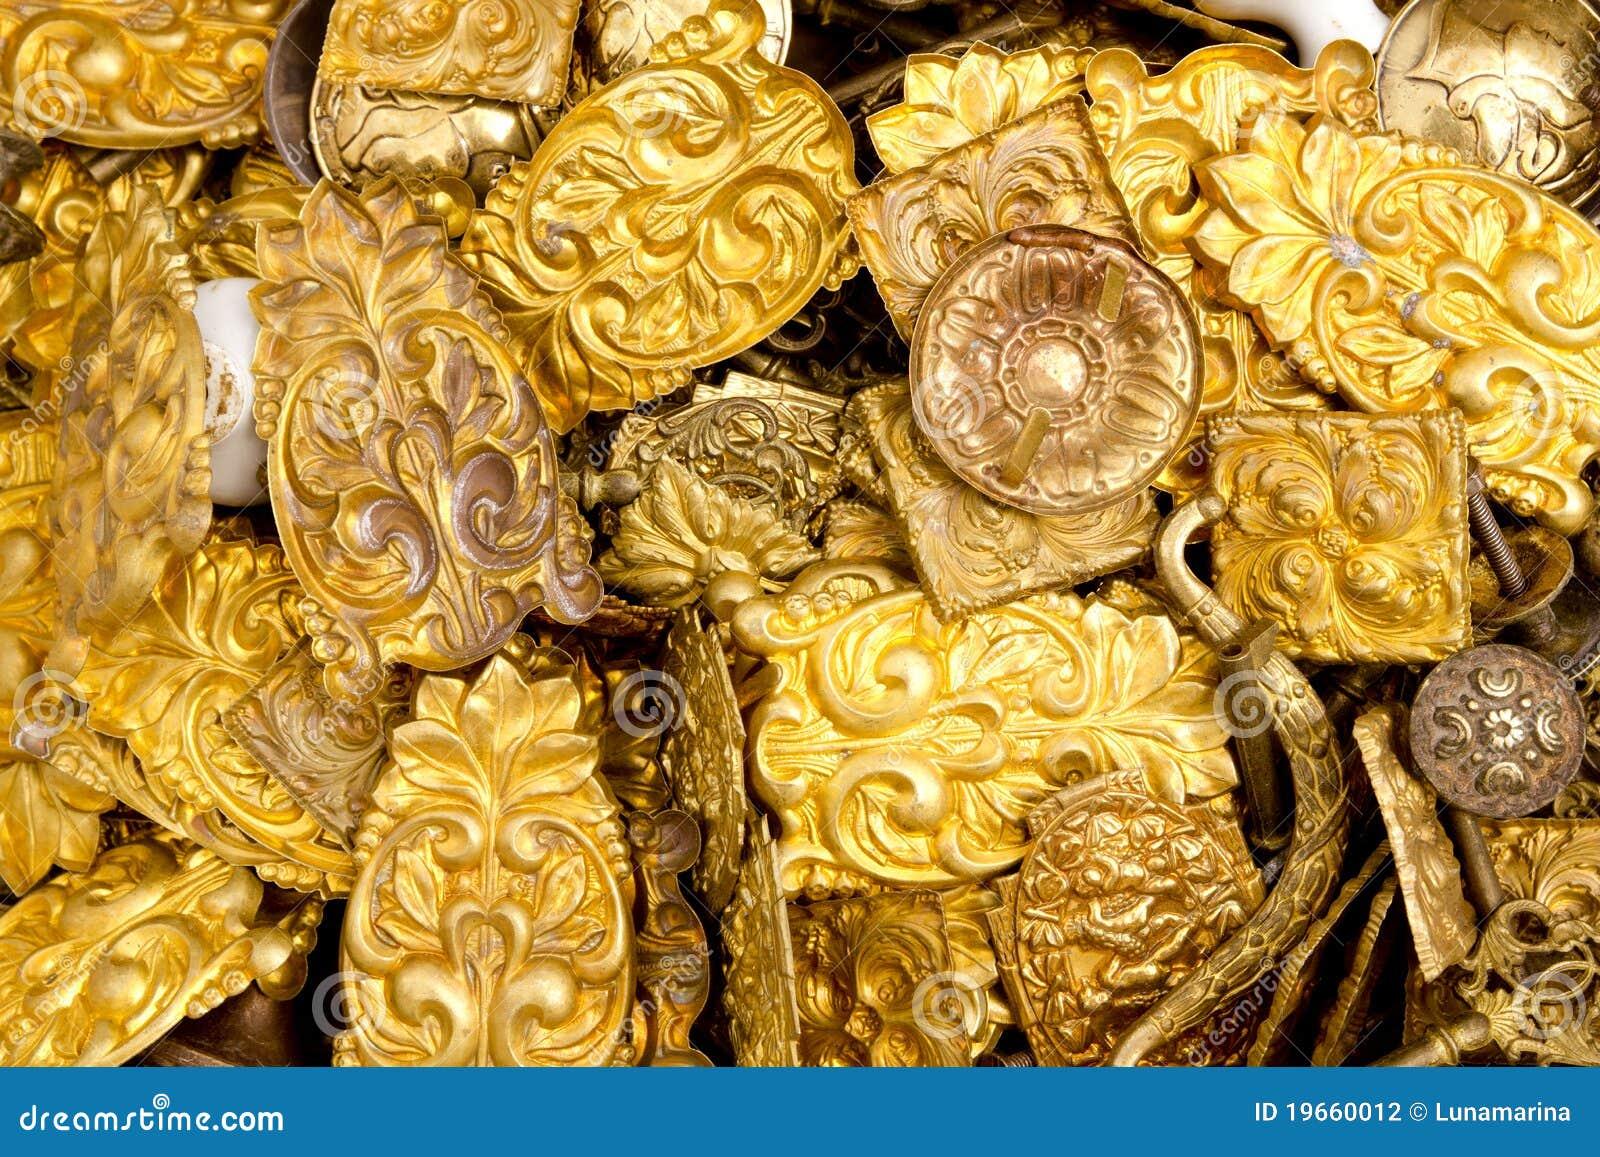 Embossed brass golden metal decorative pieces stock photo